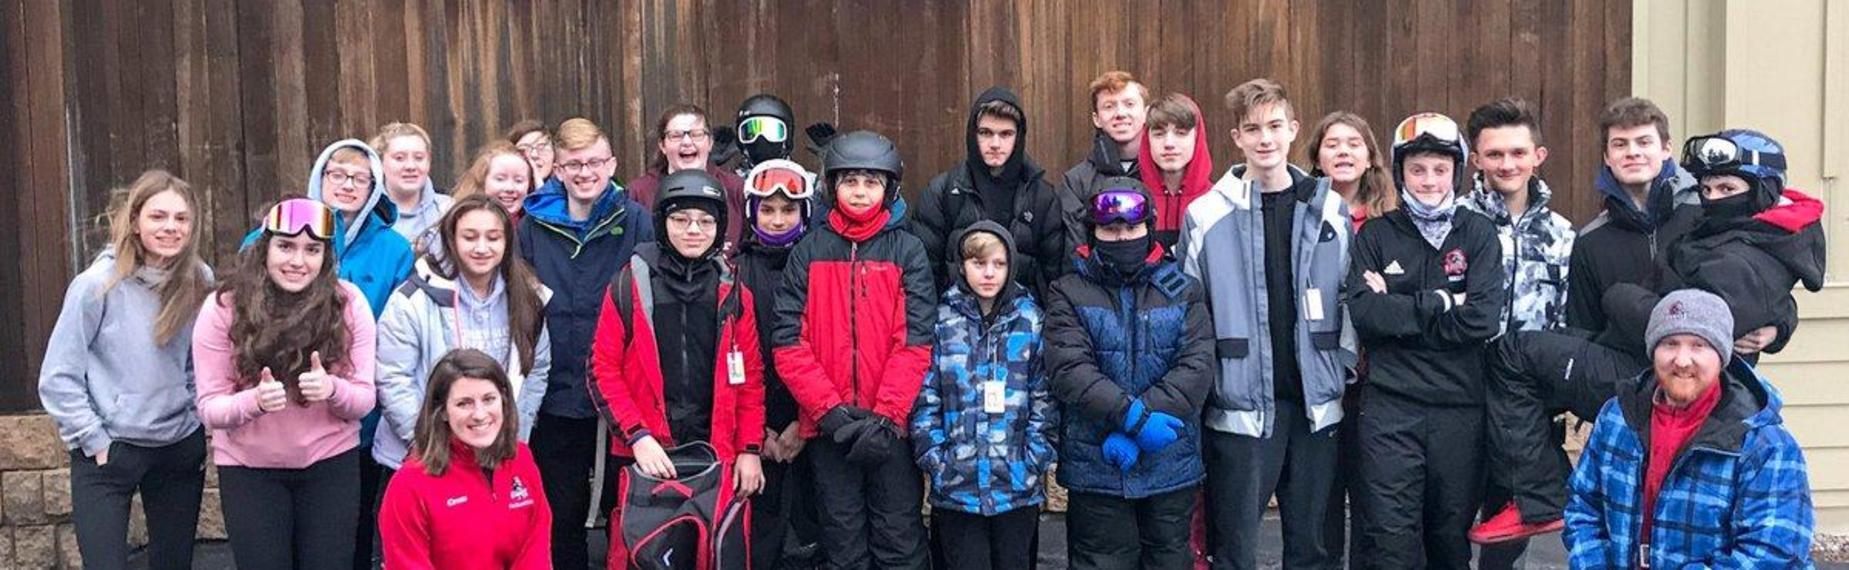 Le Roy Ski Club